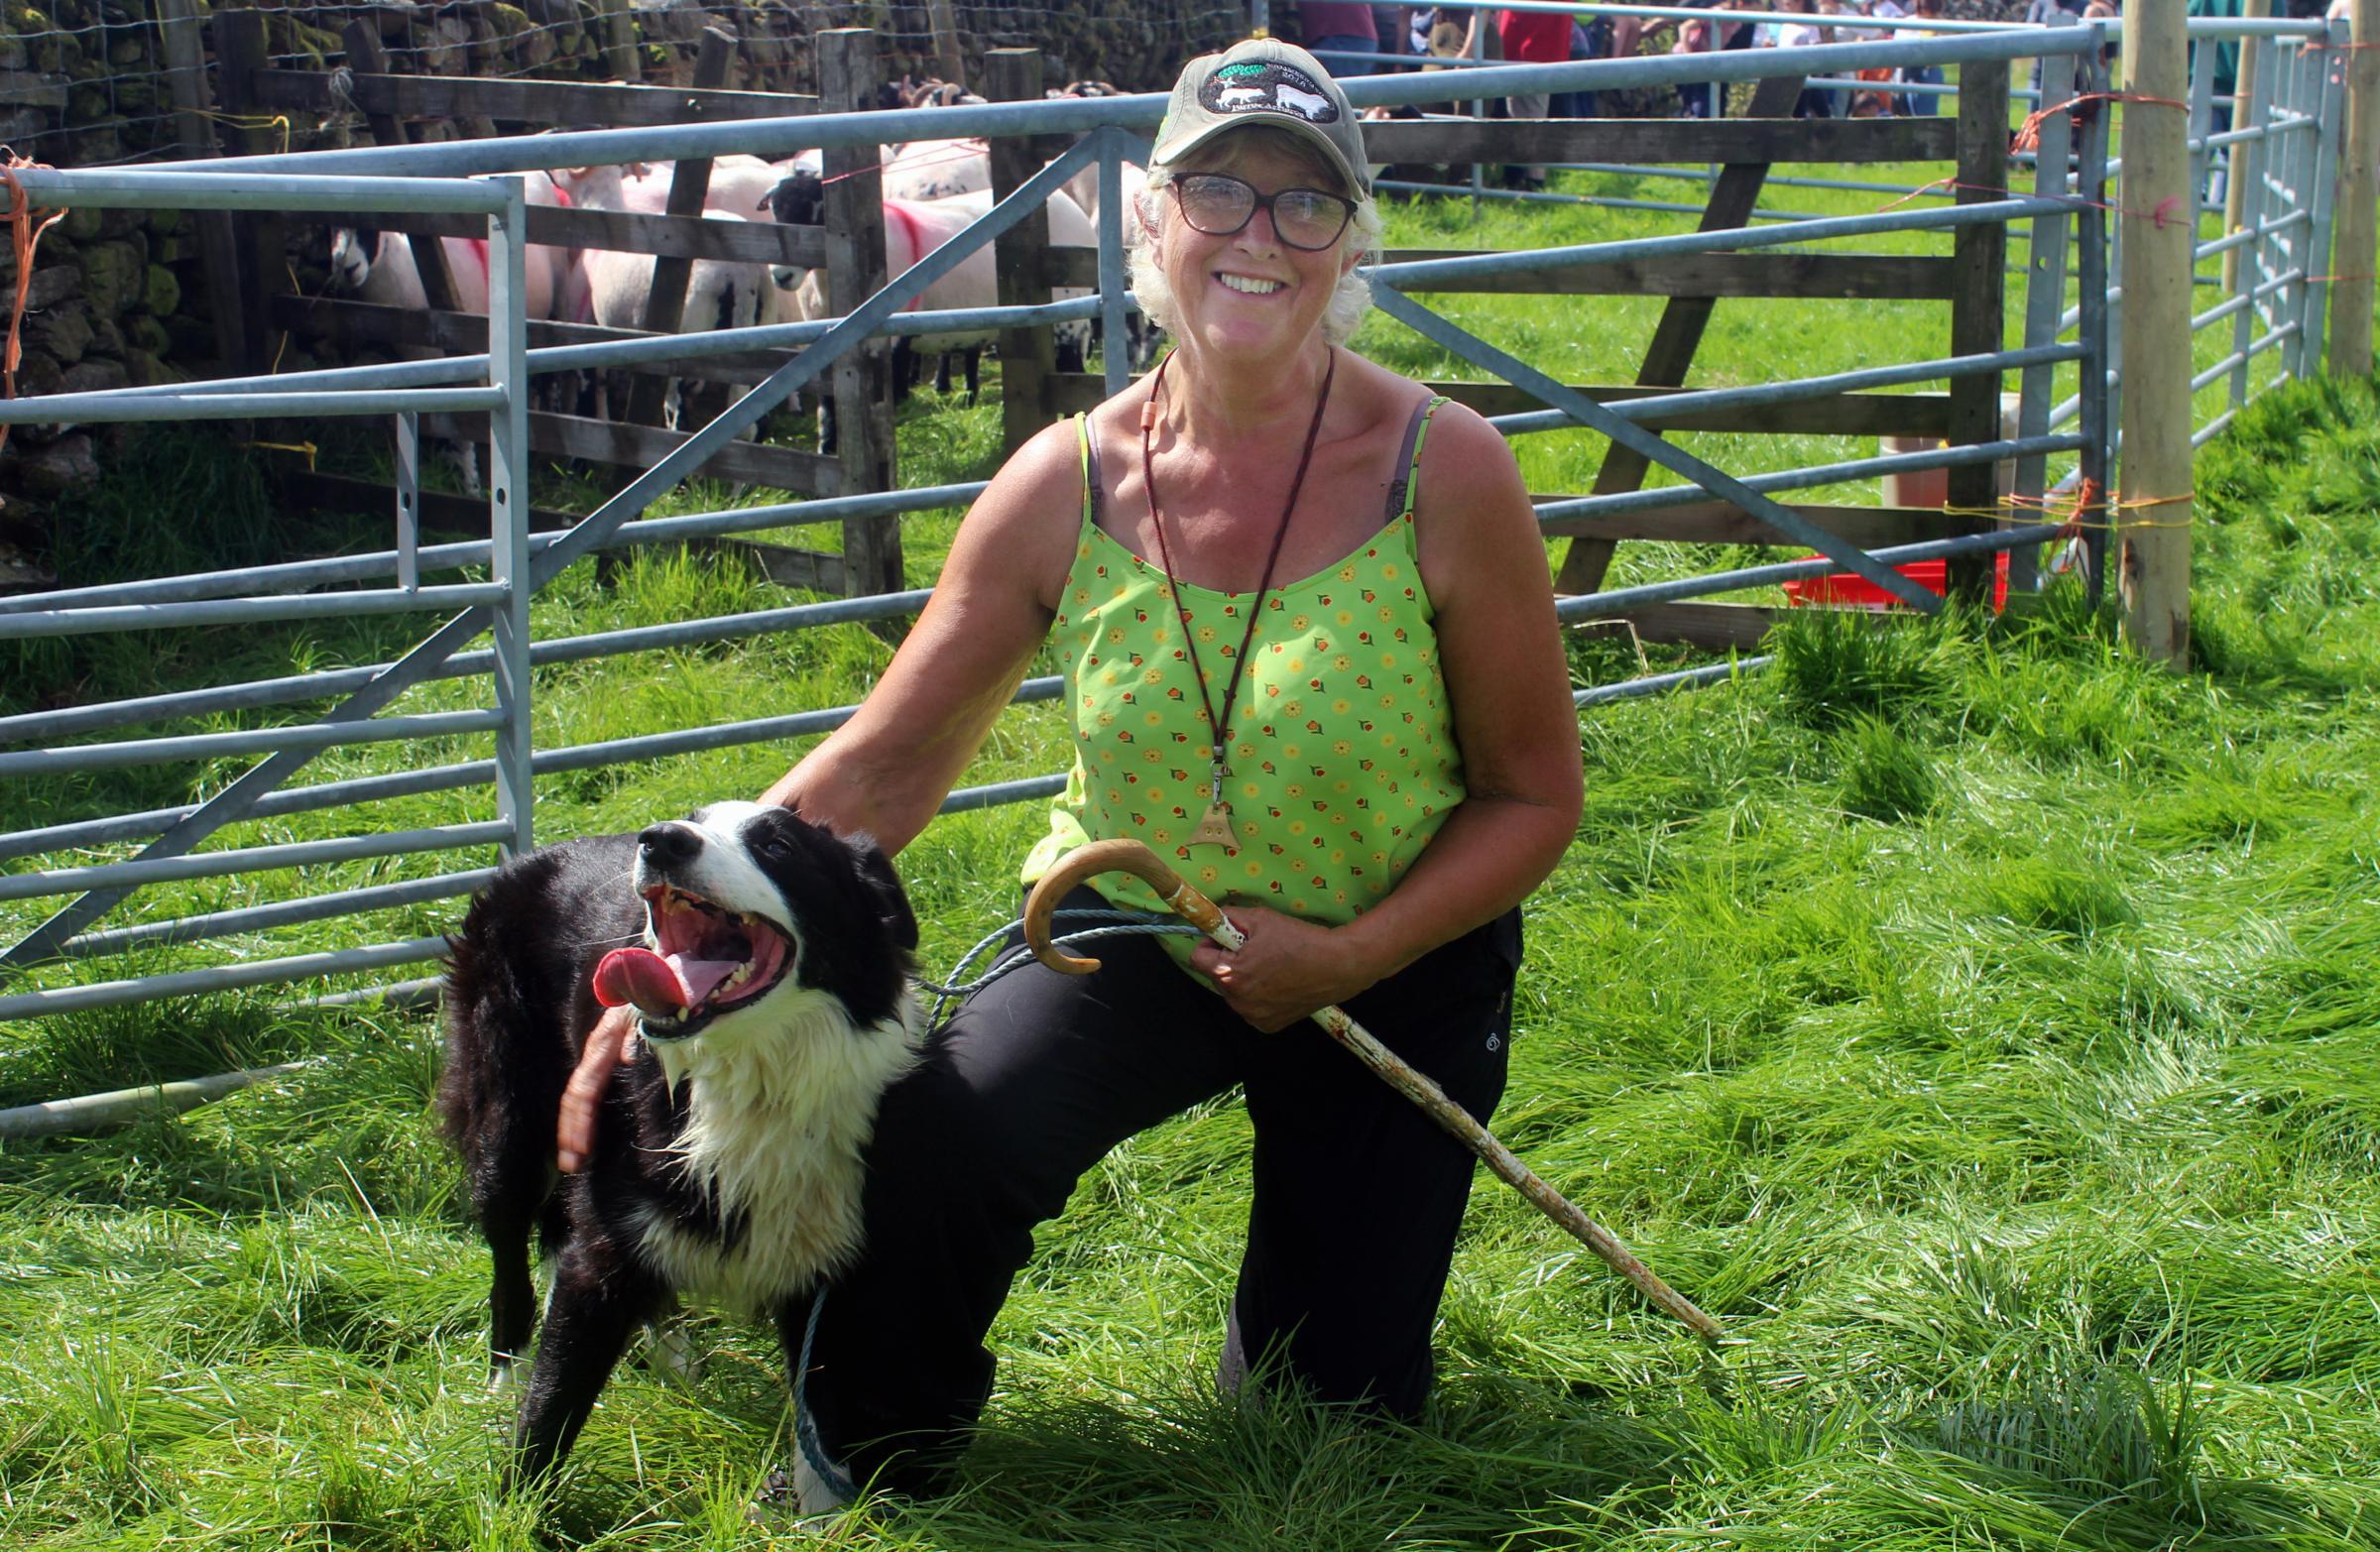 Historic sheepdog trials return to farm near Kendal